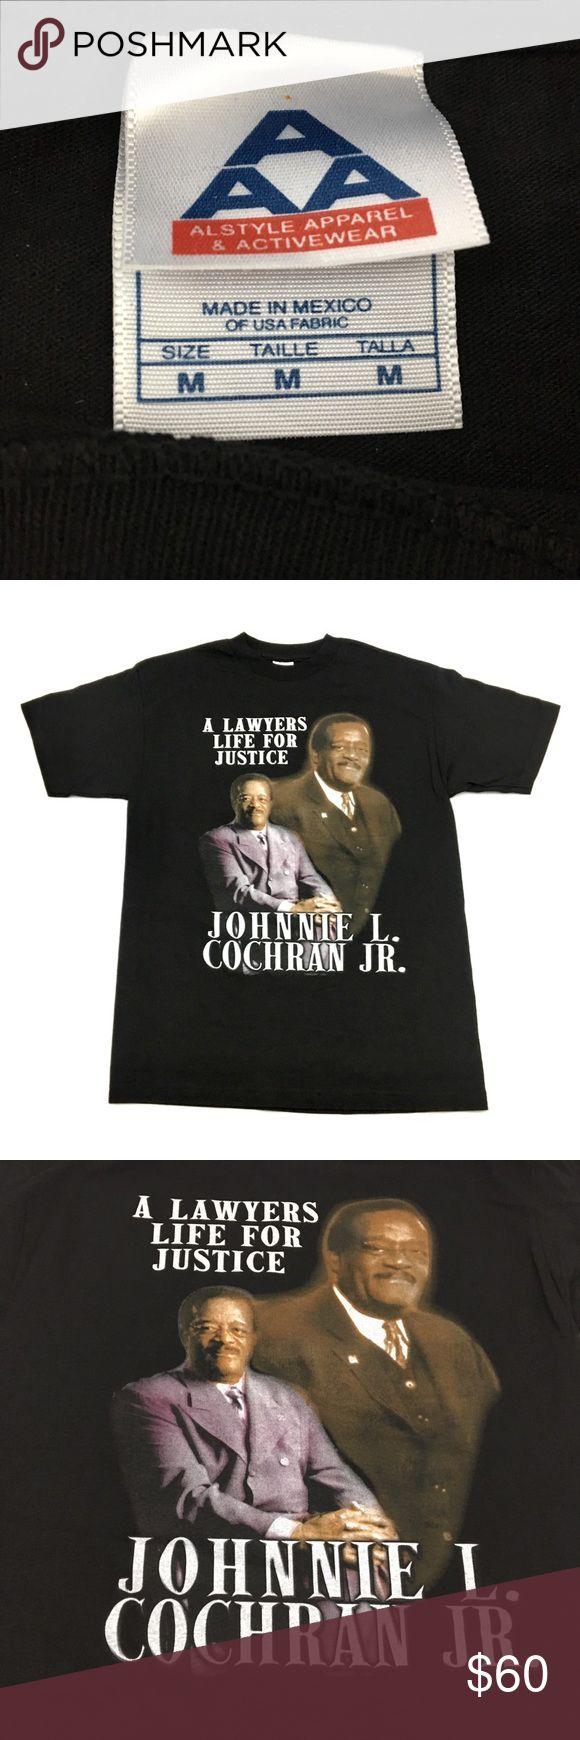 New Vintage Johnnie Cochran T Shirt Tee Nwot Tee Shirts Vintage Shirts Shirts